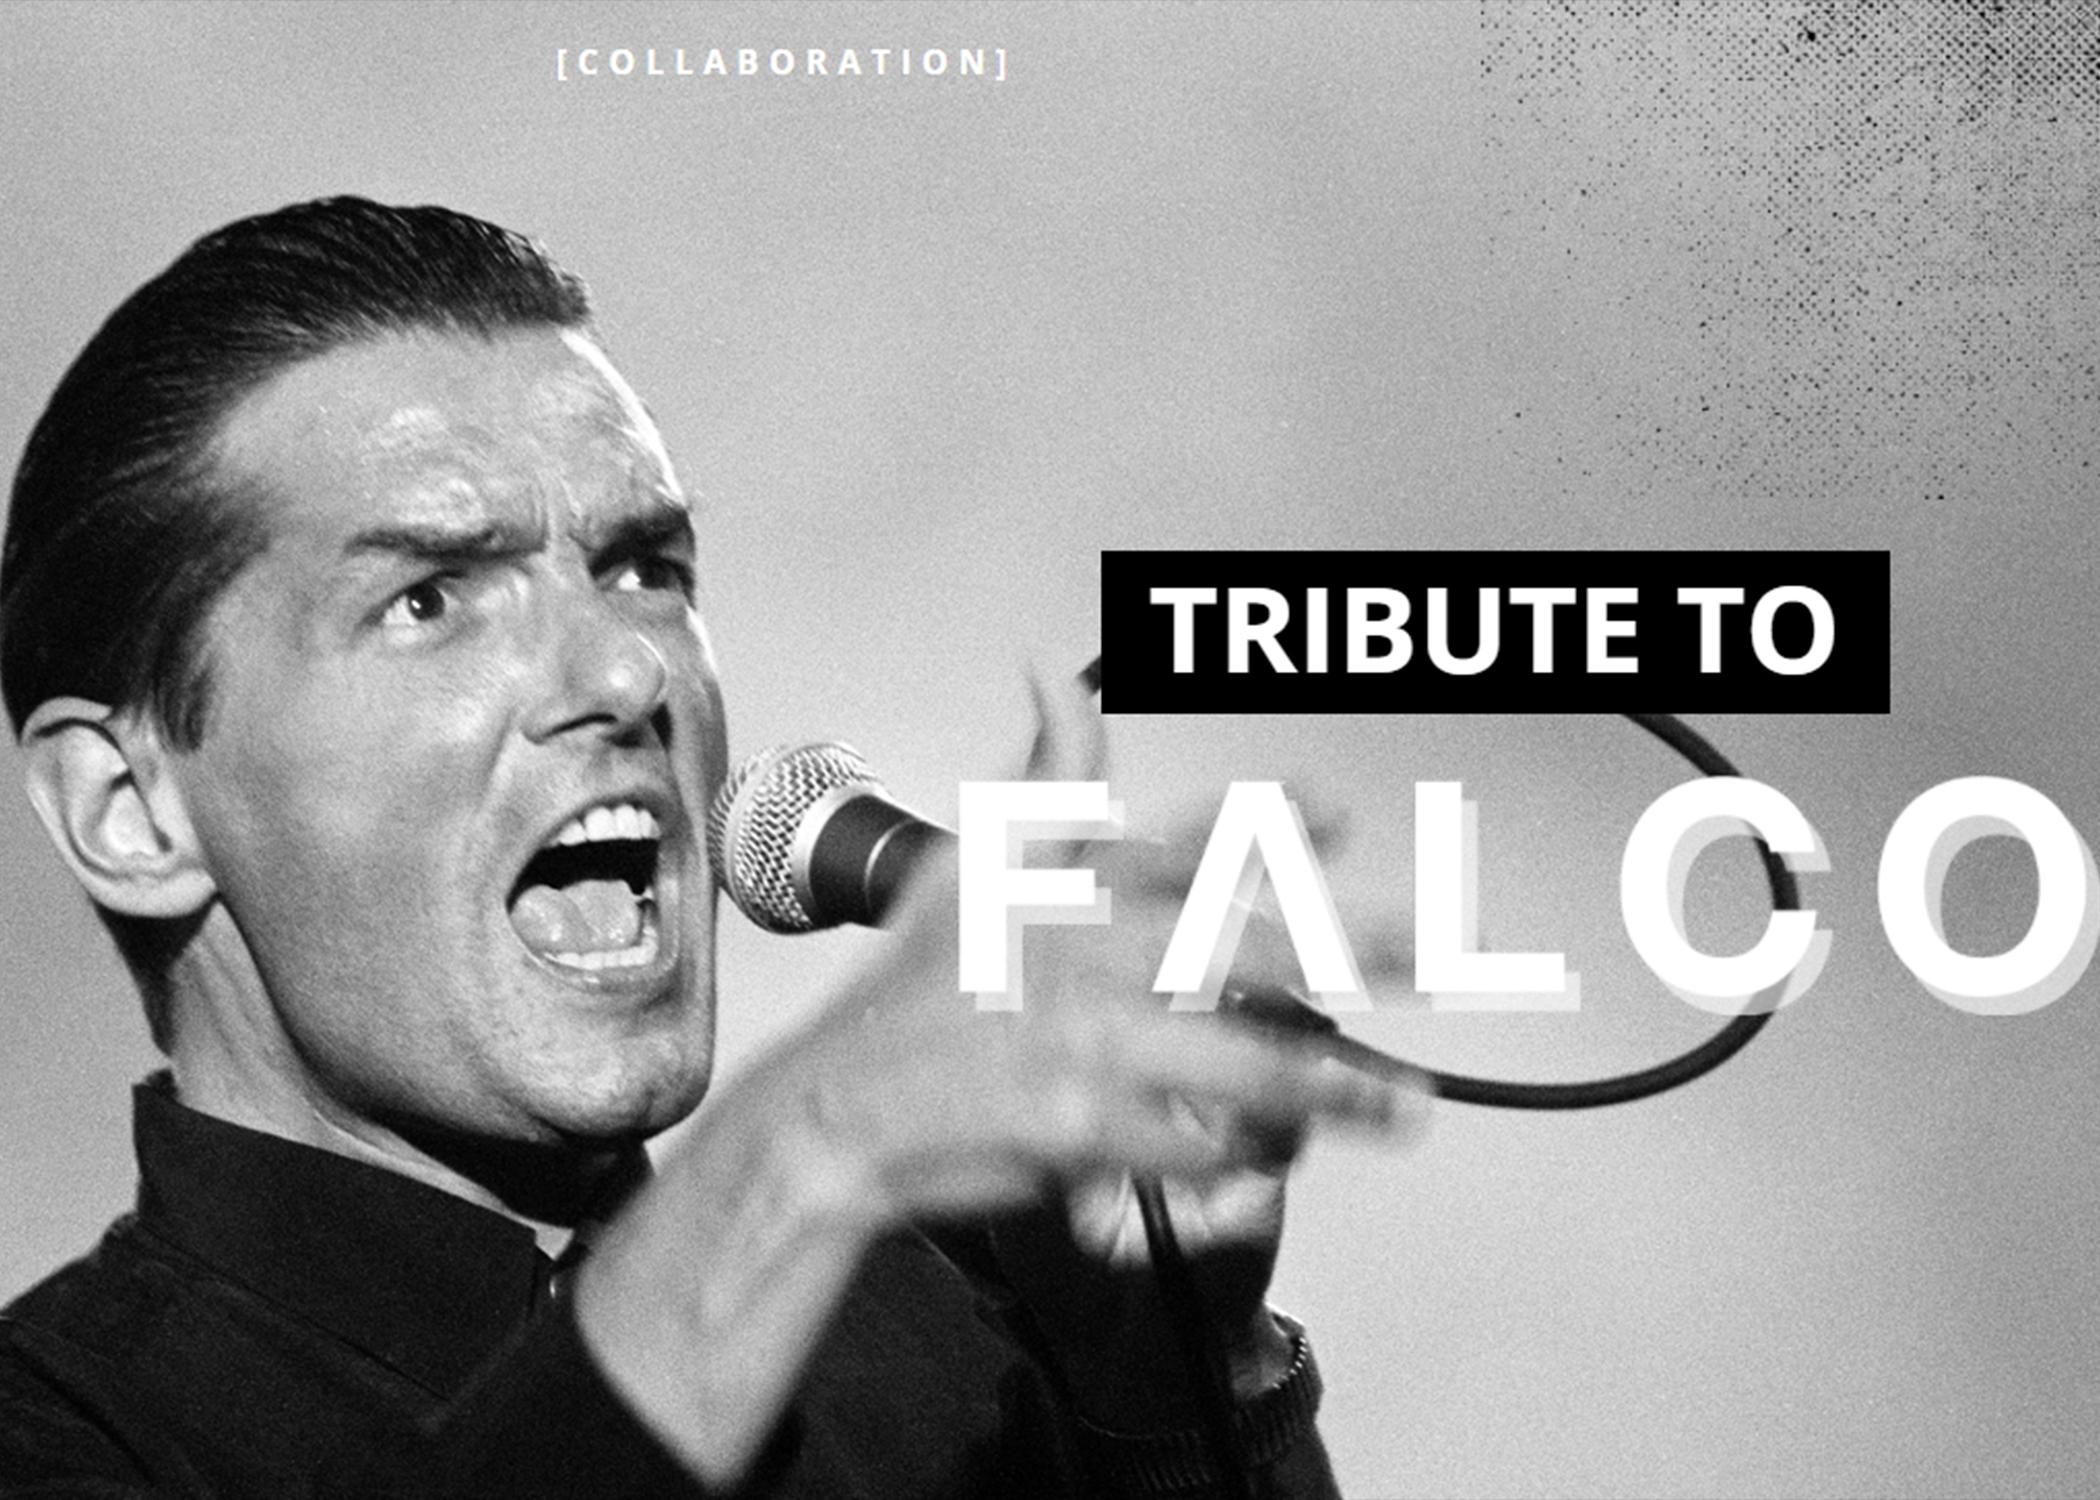 <strong>GLORYFY UNBREAKABLE feiert den KünstlerFALCO mit der unzerbrechlichen<br>TRIBUTE TO FALCO EDITION.</strong>